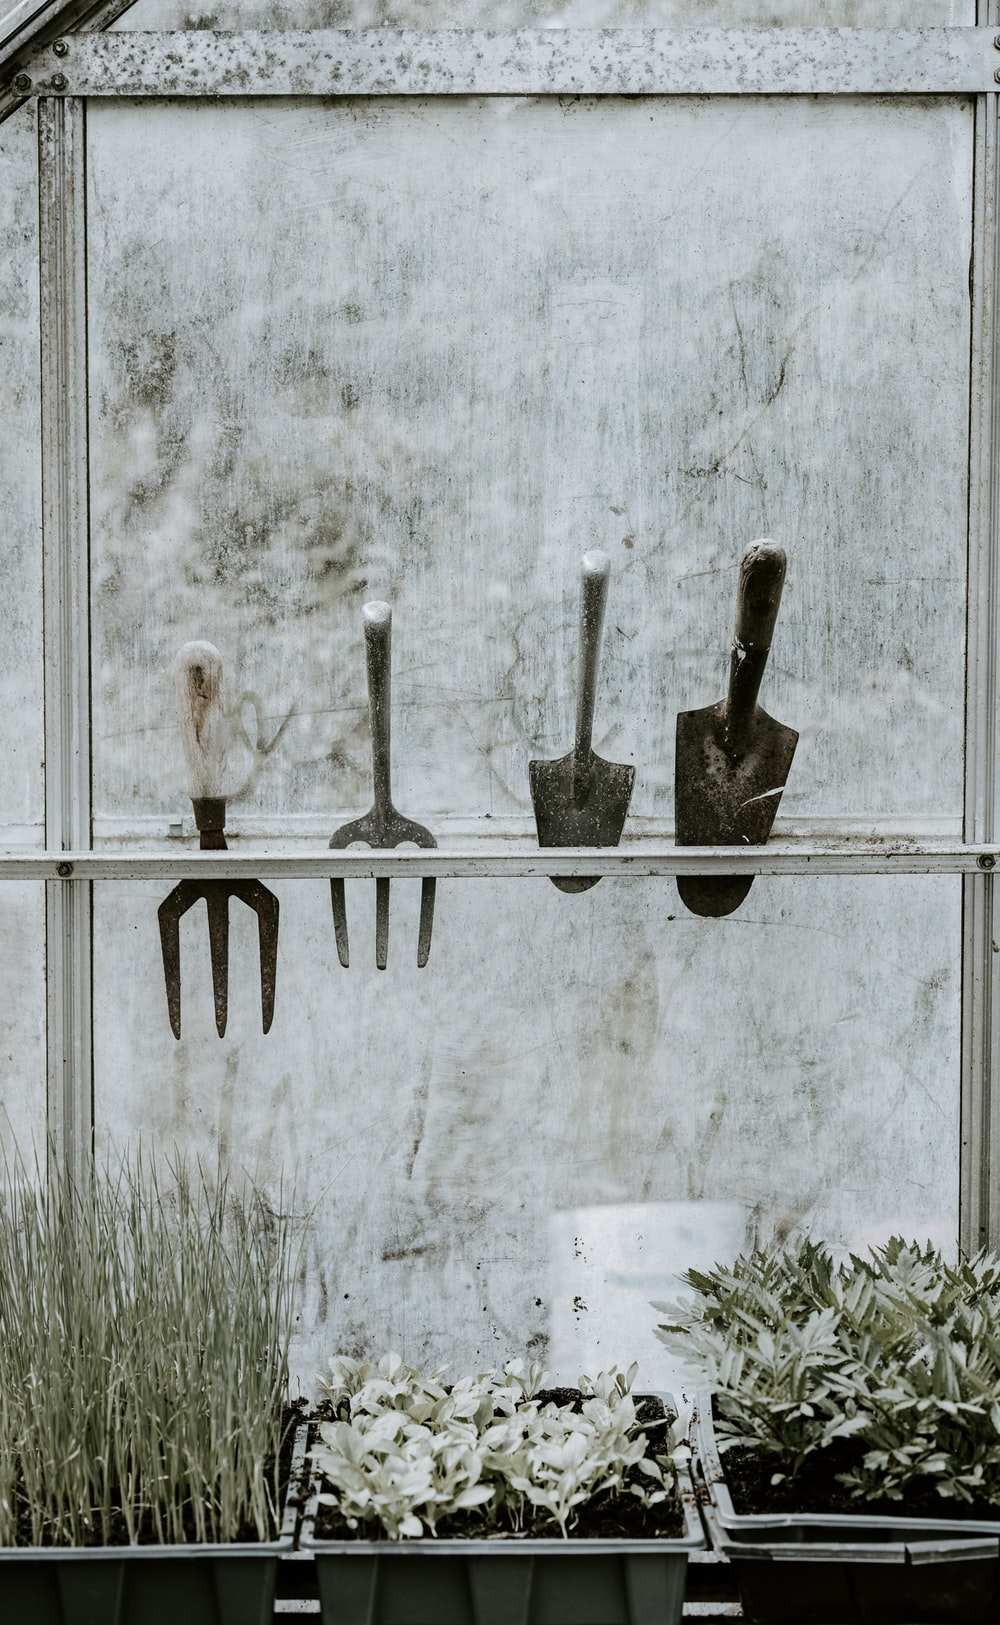 four handheld gardening tools on rack